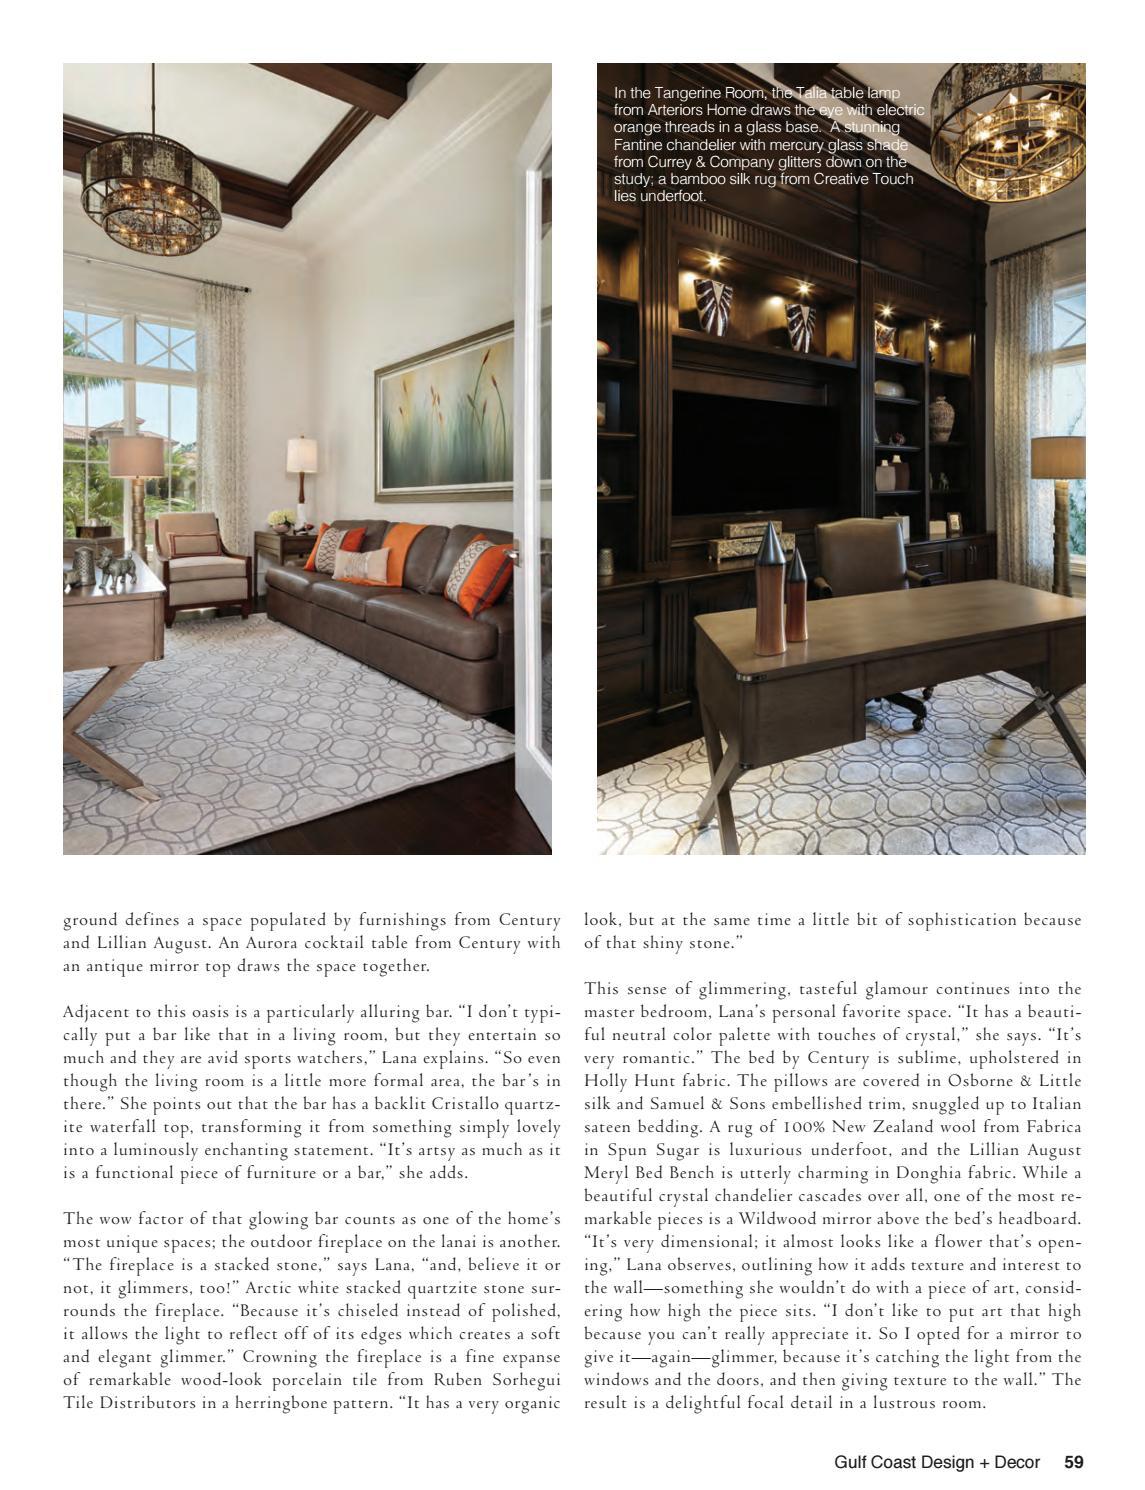 Pleasant Gulf Coast Design Decor By East Coast Home Publishing Issuu Lamtechconsult Wood Chair Design Ideas Lamtechconsultcom